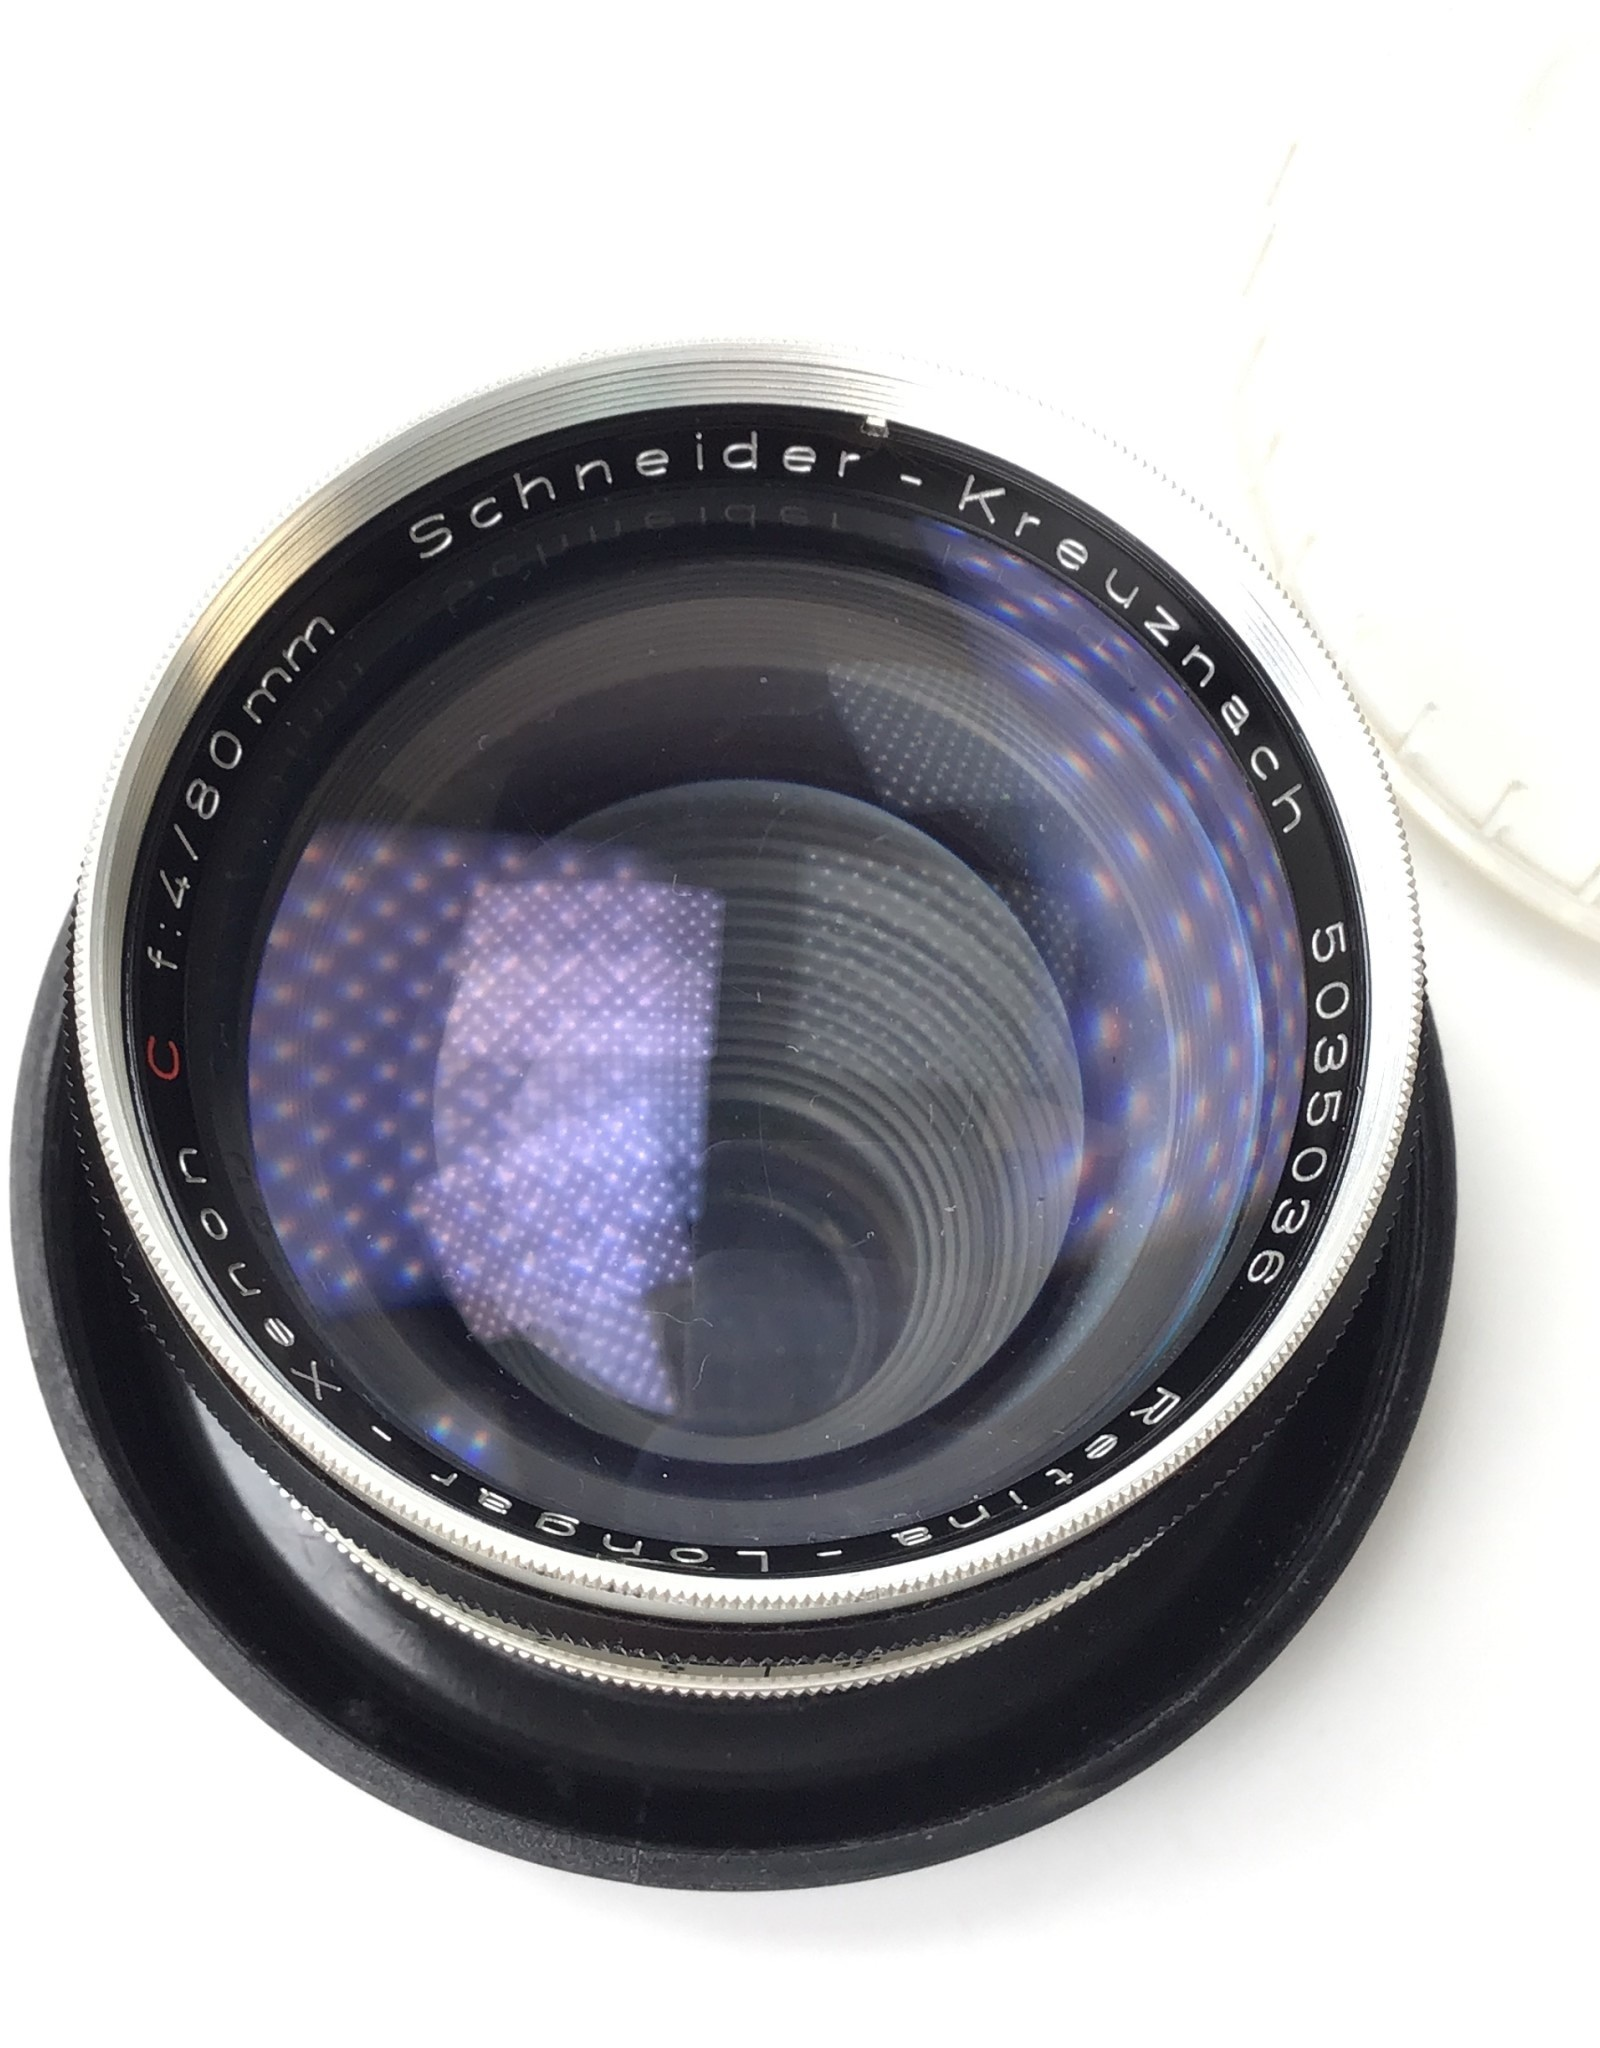 Retina C Schneider Longar-Xenon 80mm f4 Lens Used Good